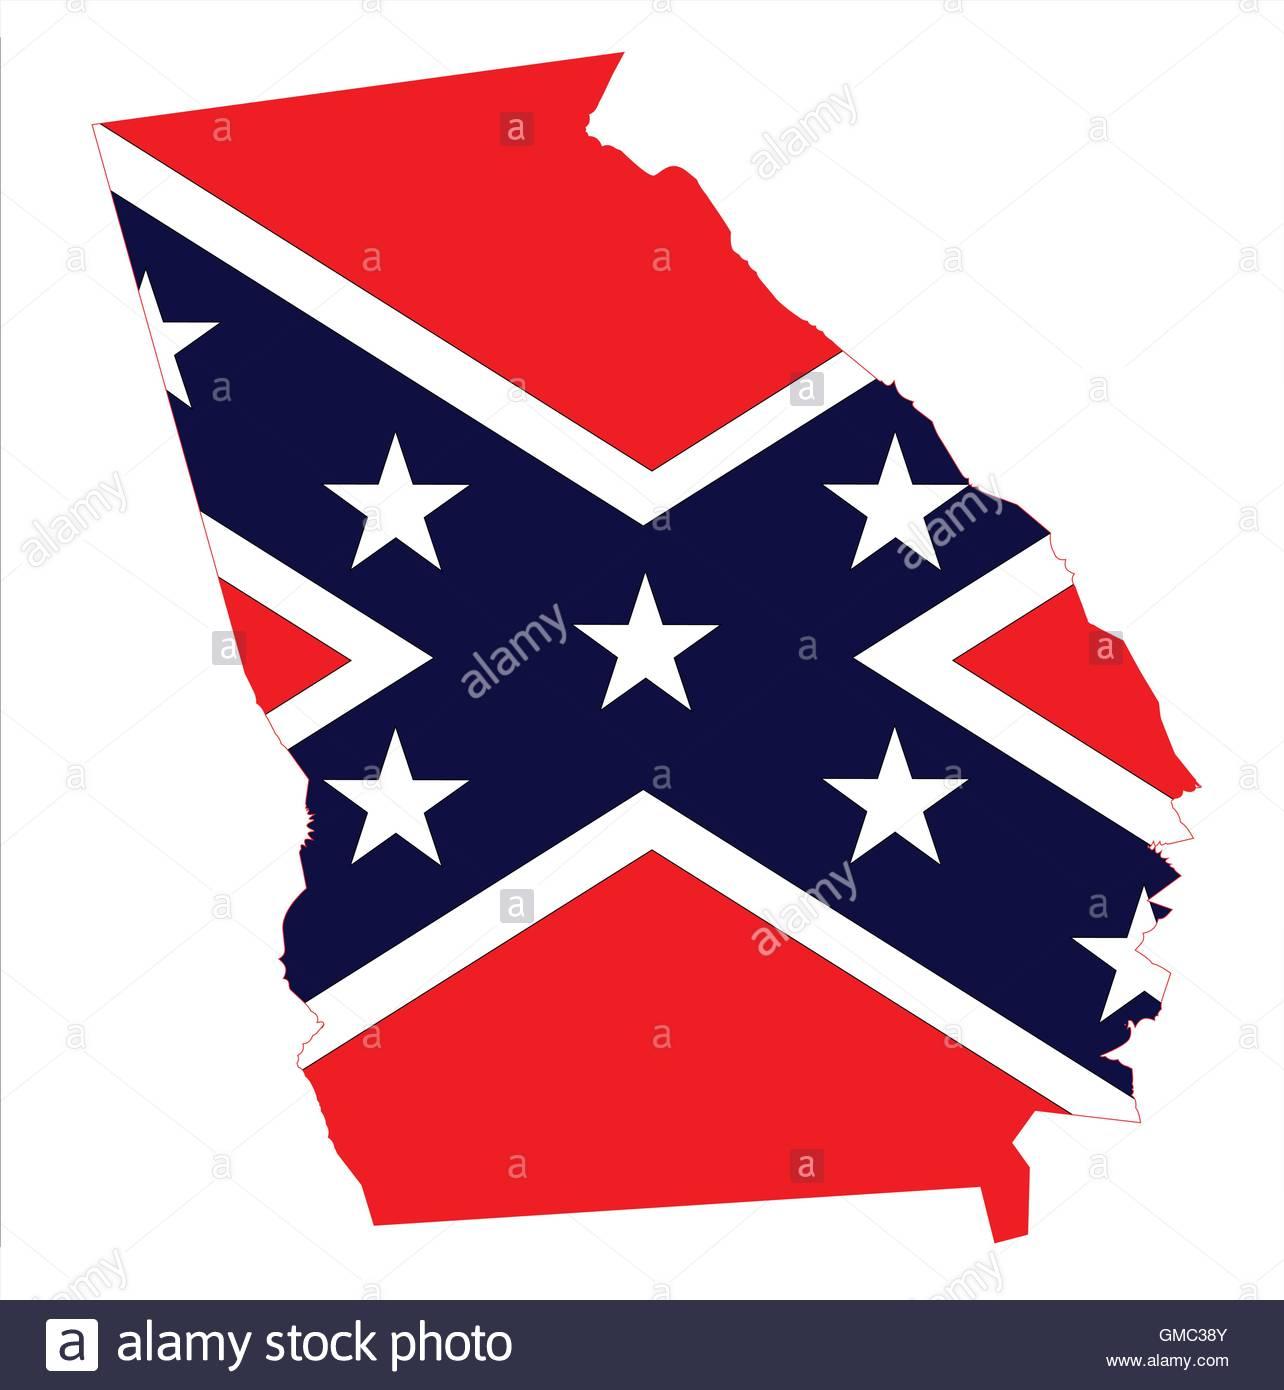 1284x1390 Georgia Map And Confederate Flag Stock Vector Art Amp Illustration